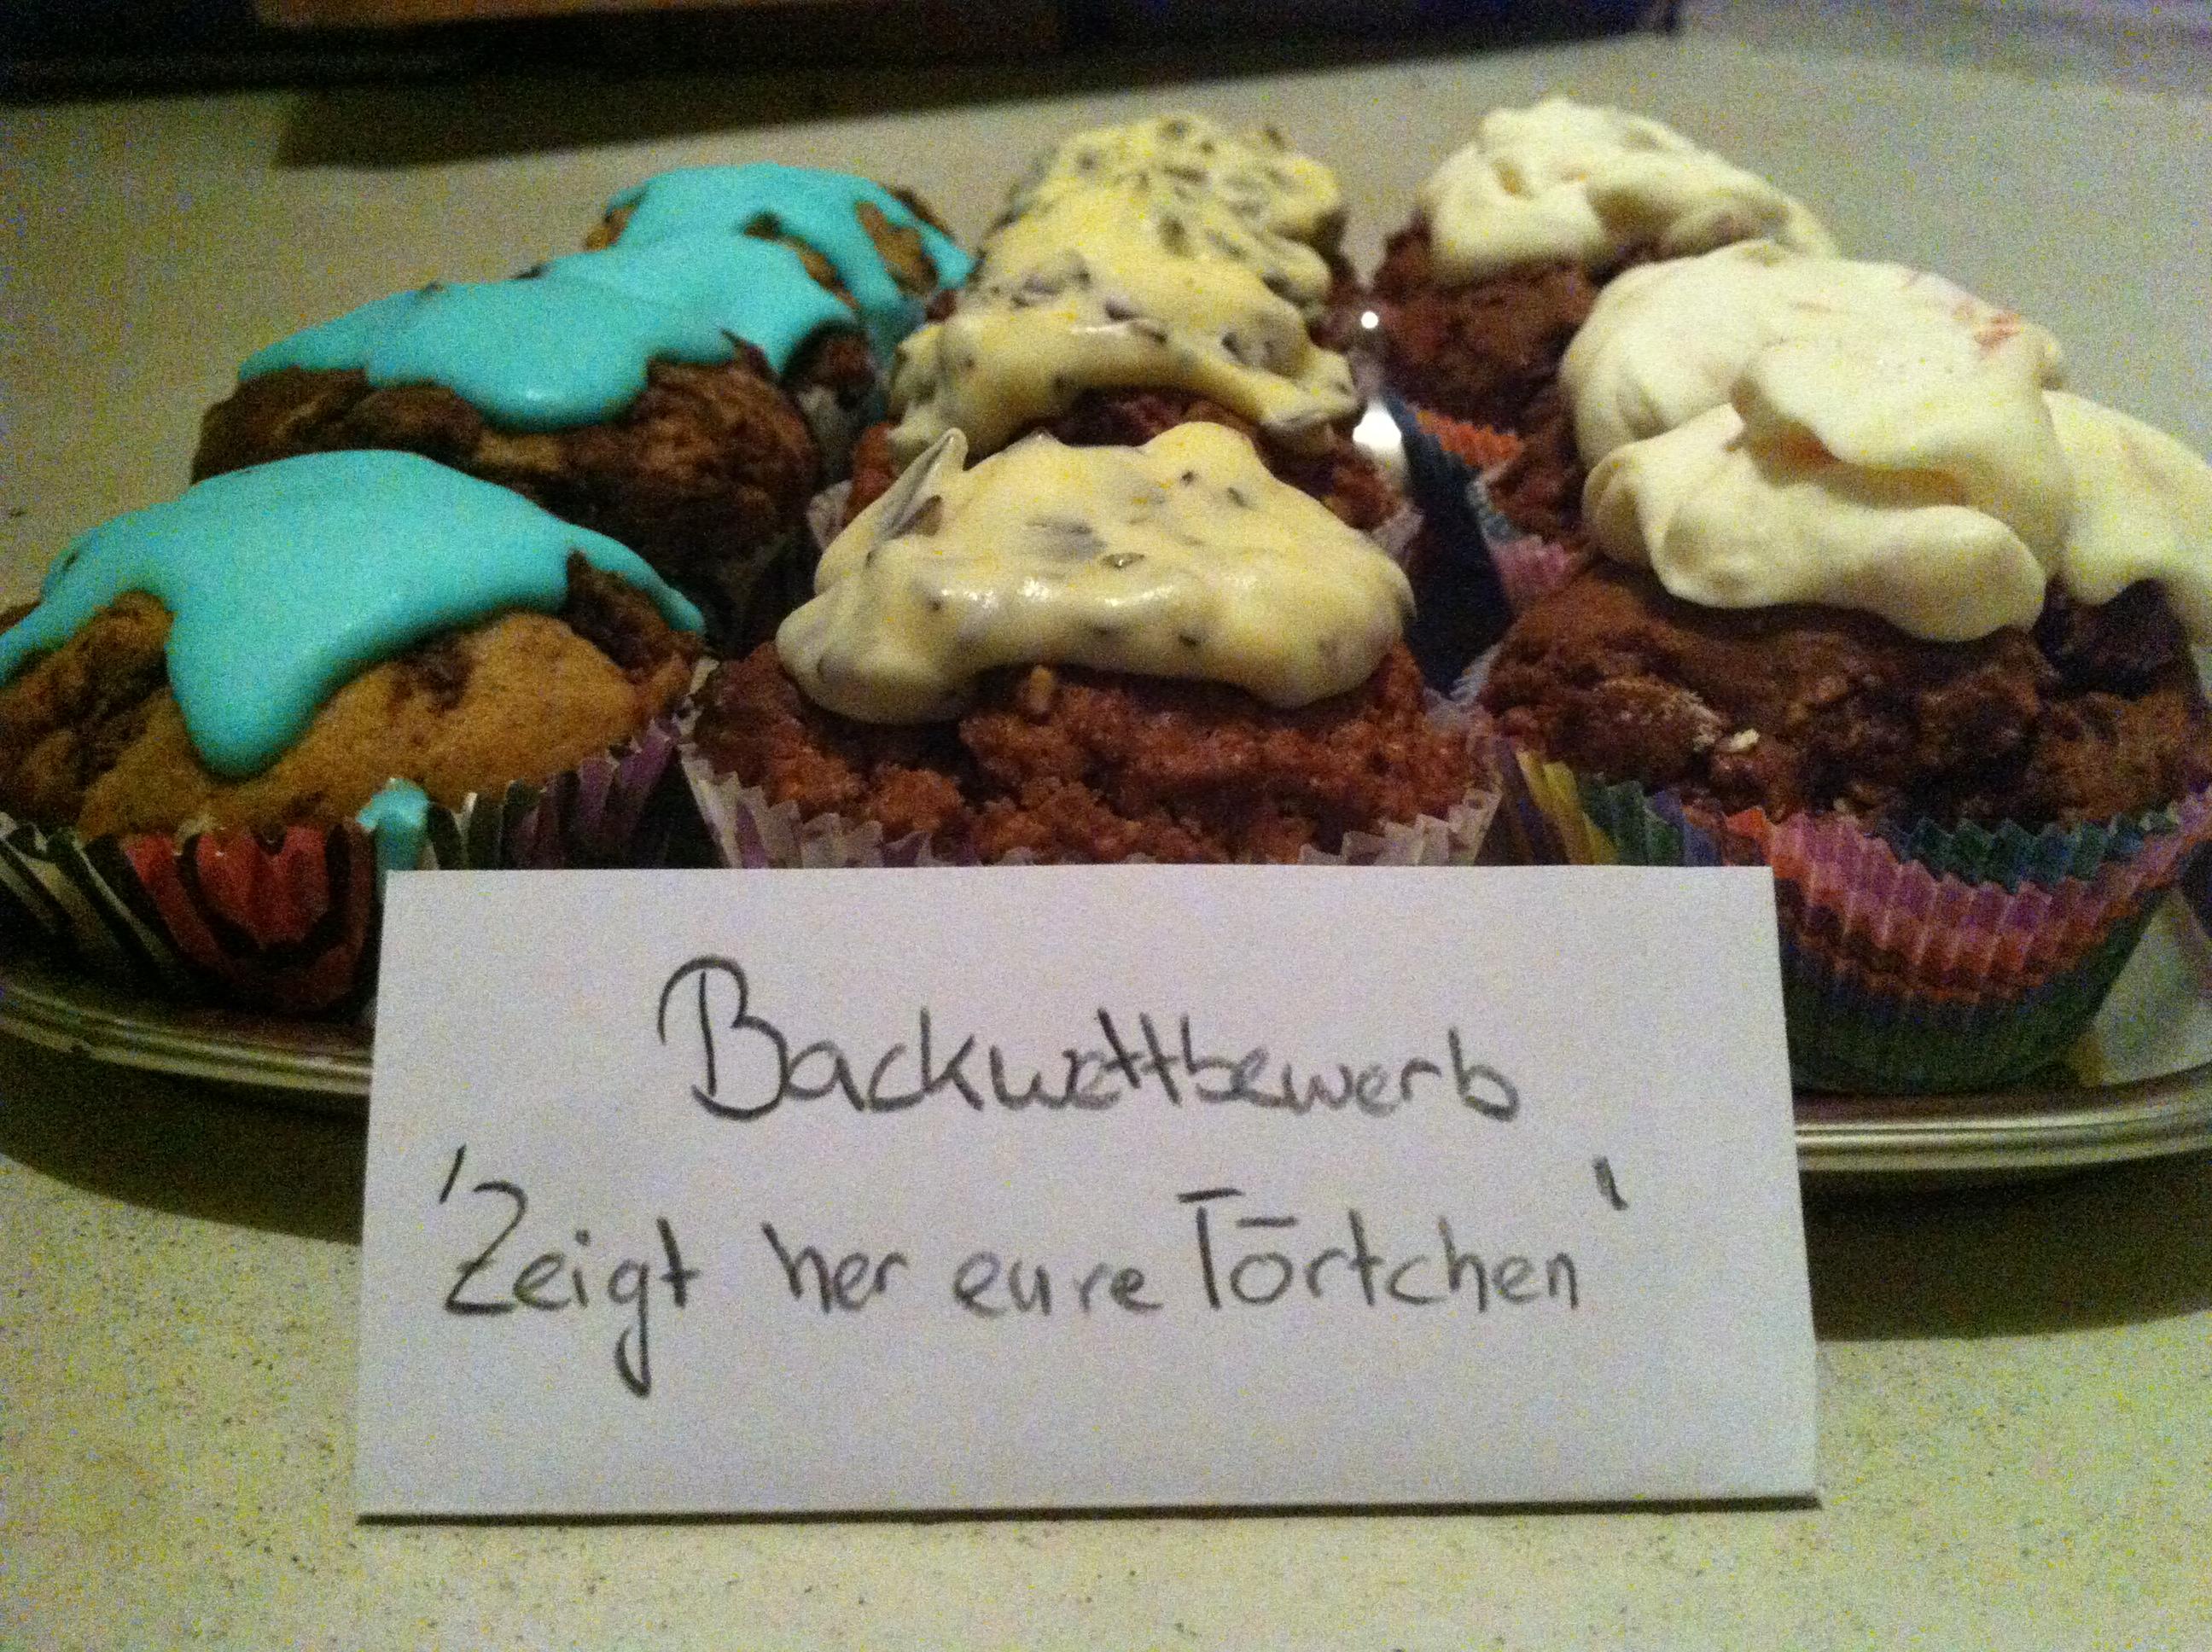 Backwettbewerb Cupcakes